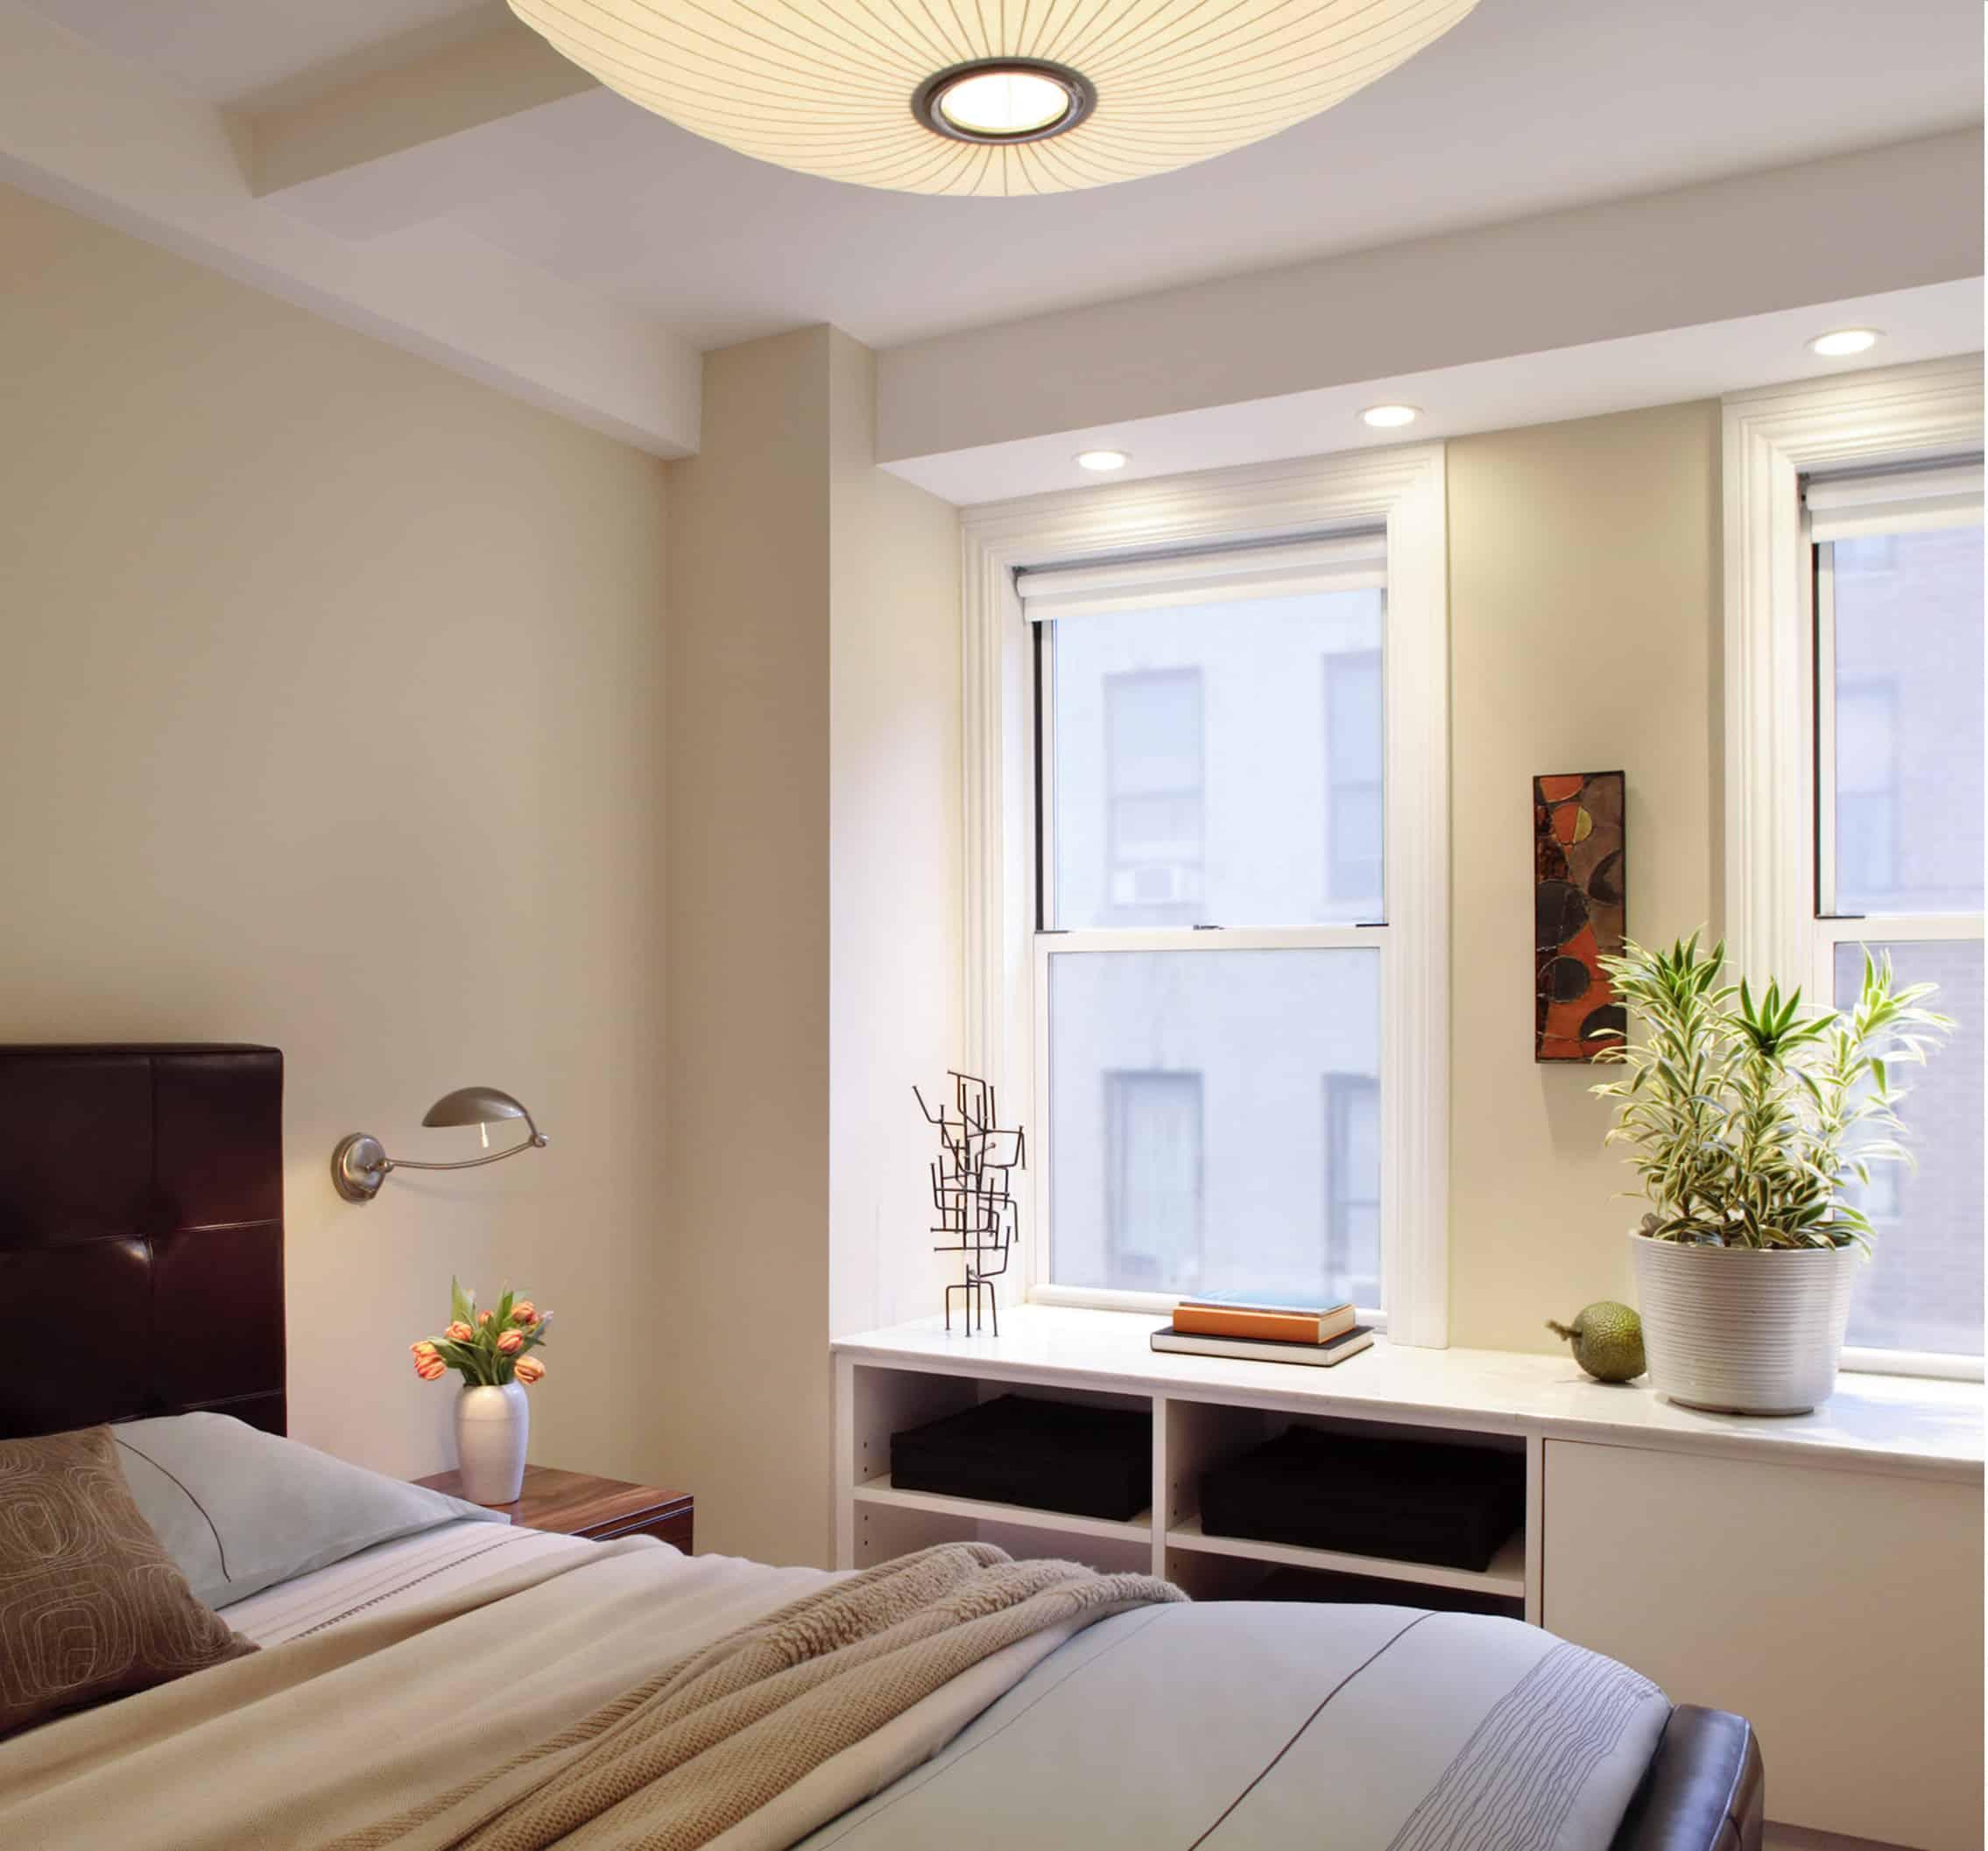 Master bedroom interior design New York City